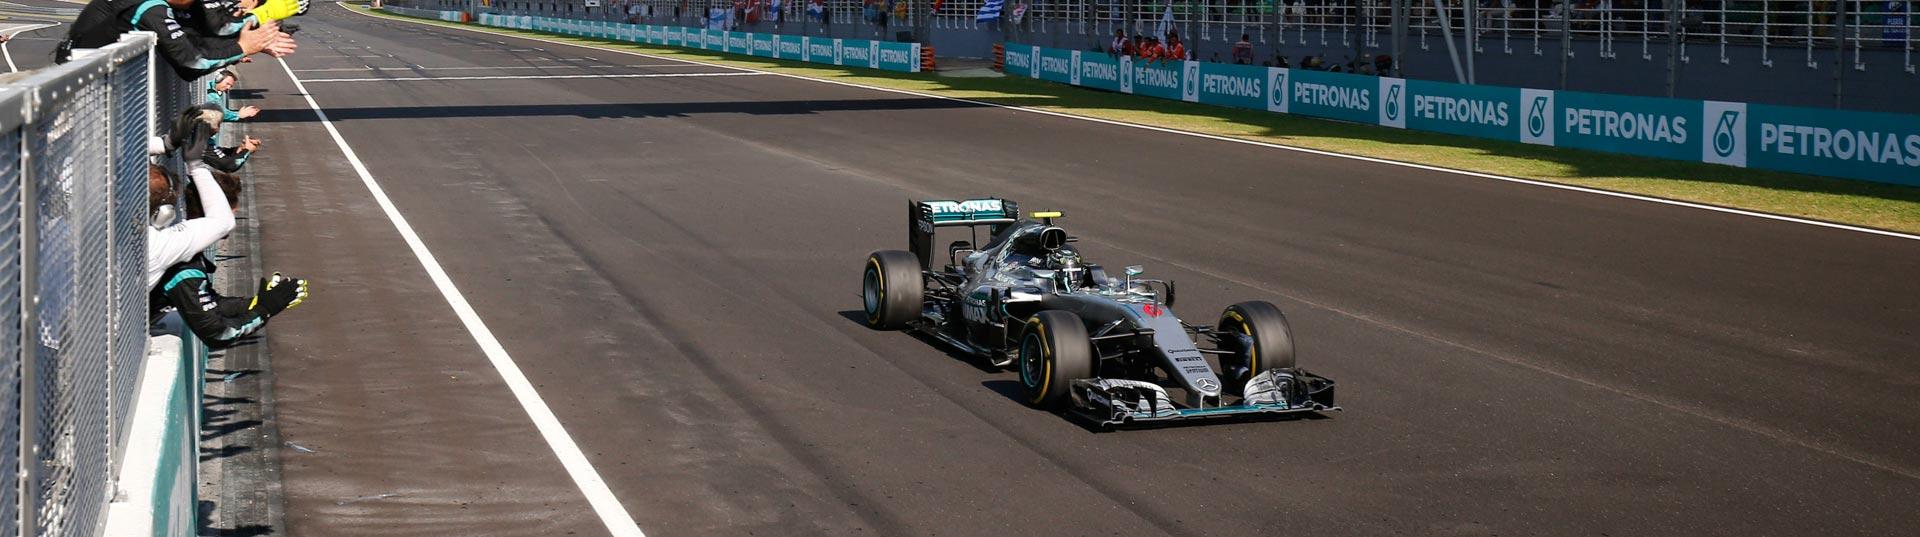 Nico Rosberg na Malásia